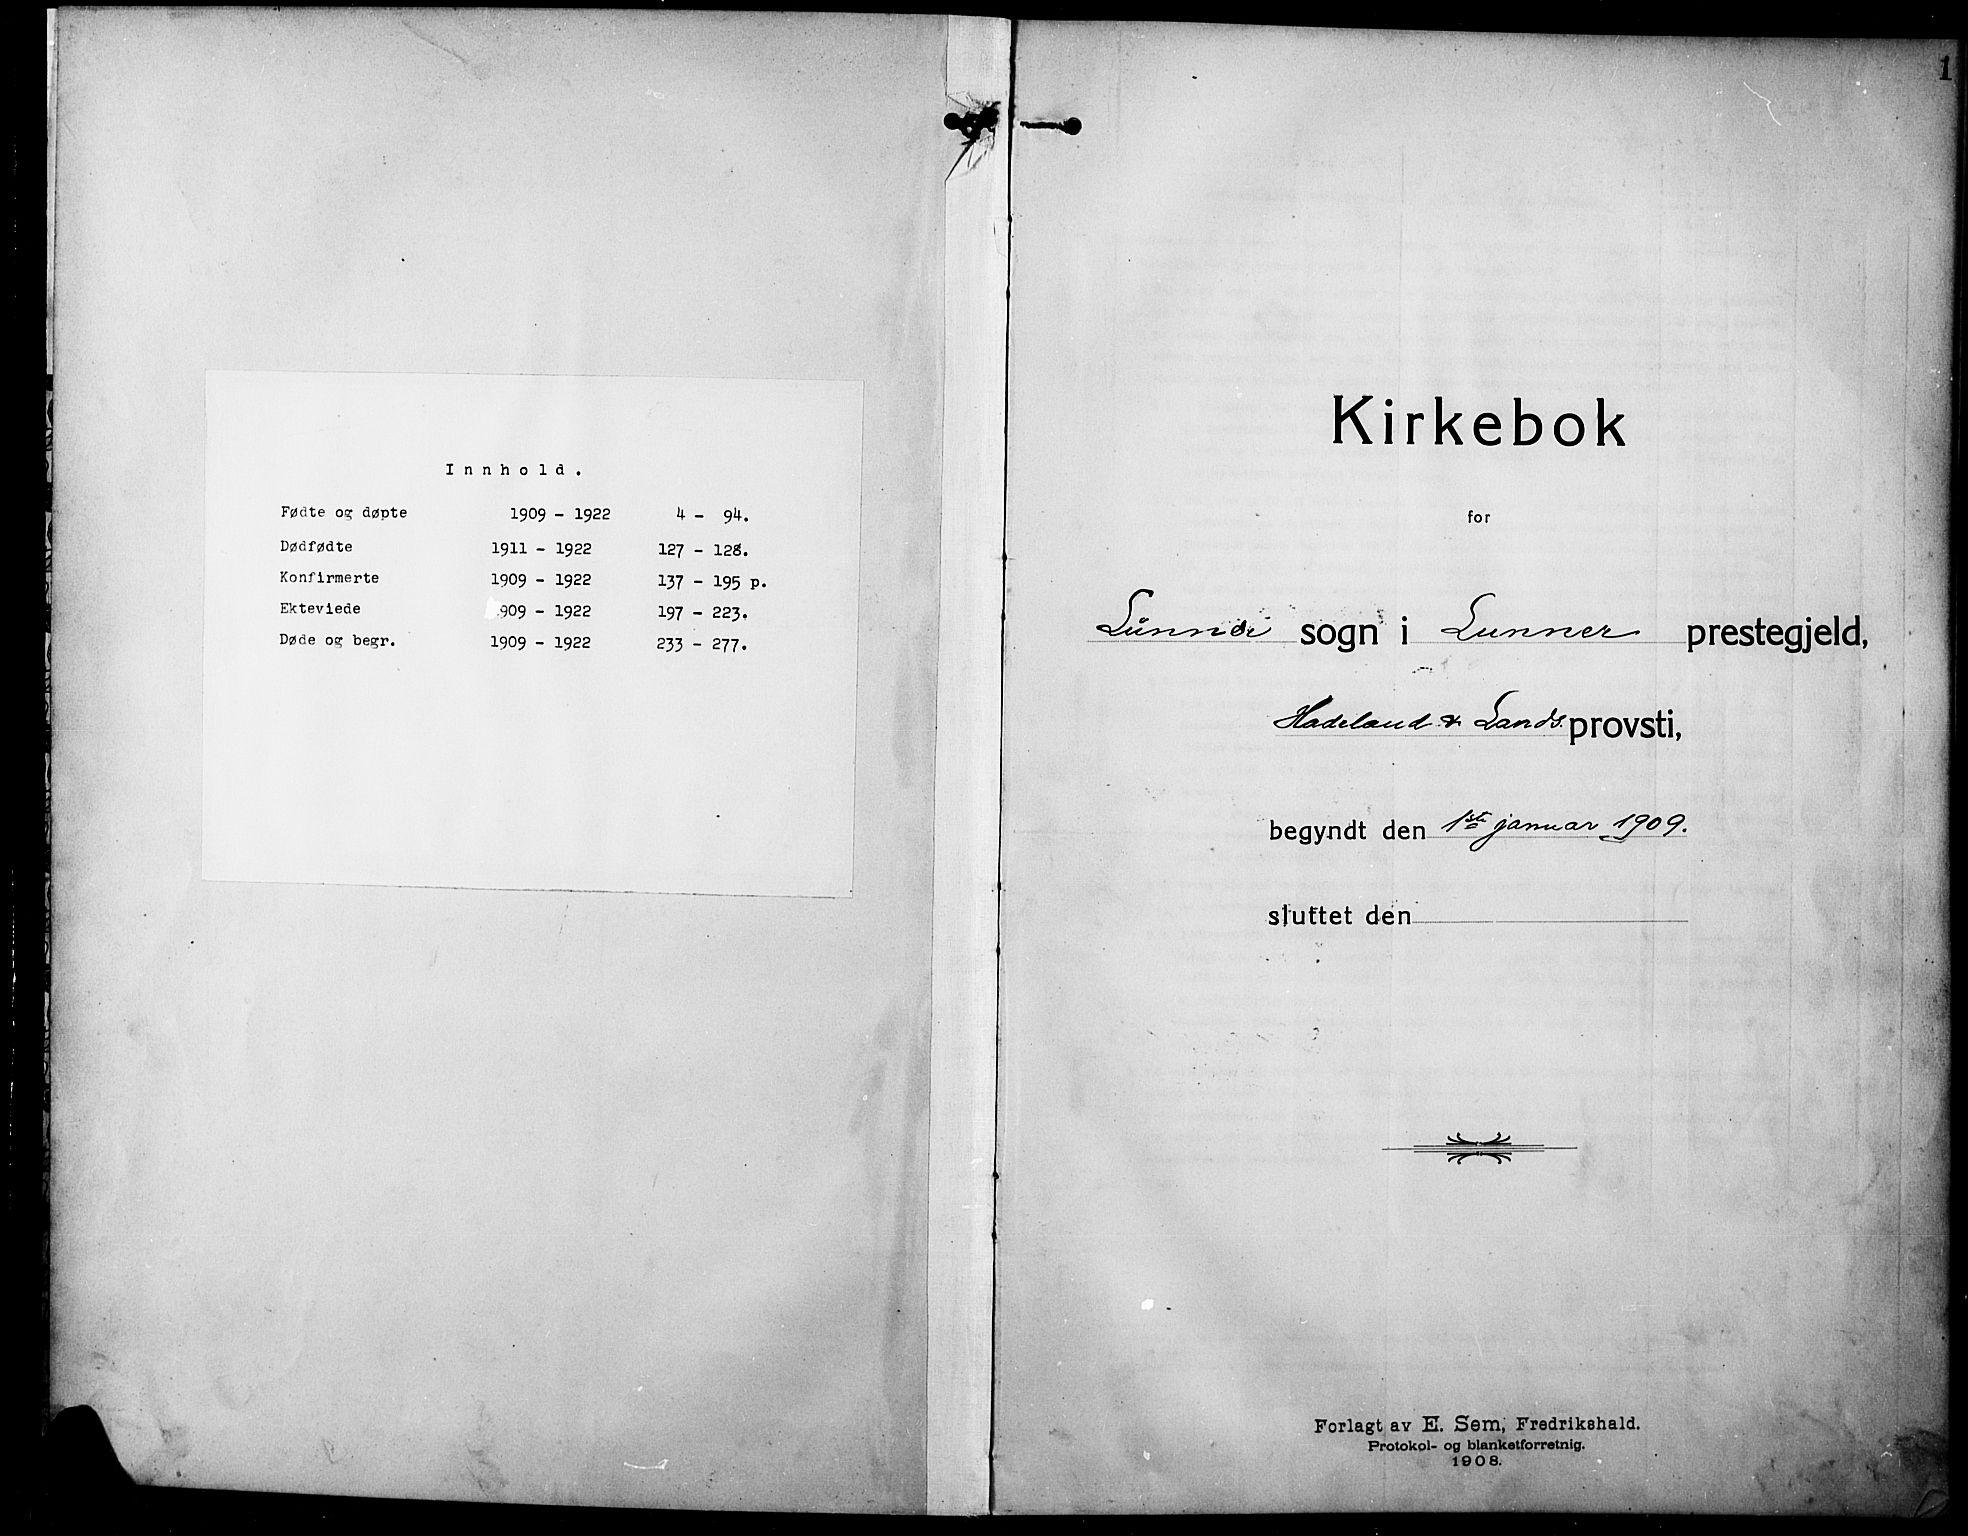 SAH, Lunner prestekontor, H/Ha/Hab/L0001: Klokkerbok nr. 1, 1909-1922, s. 1